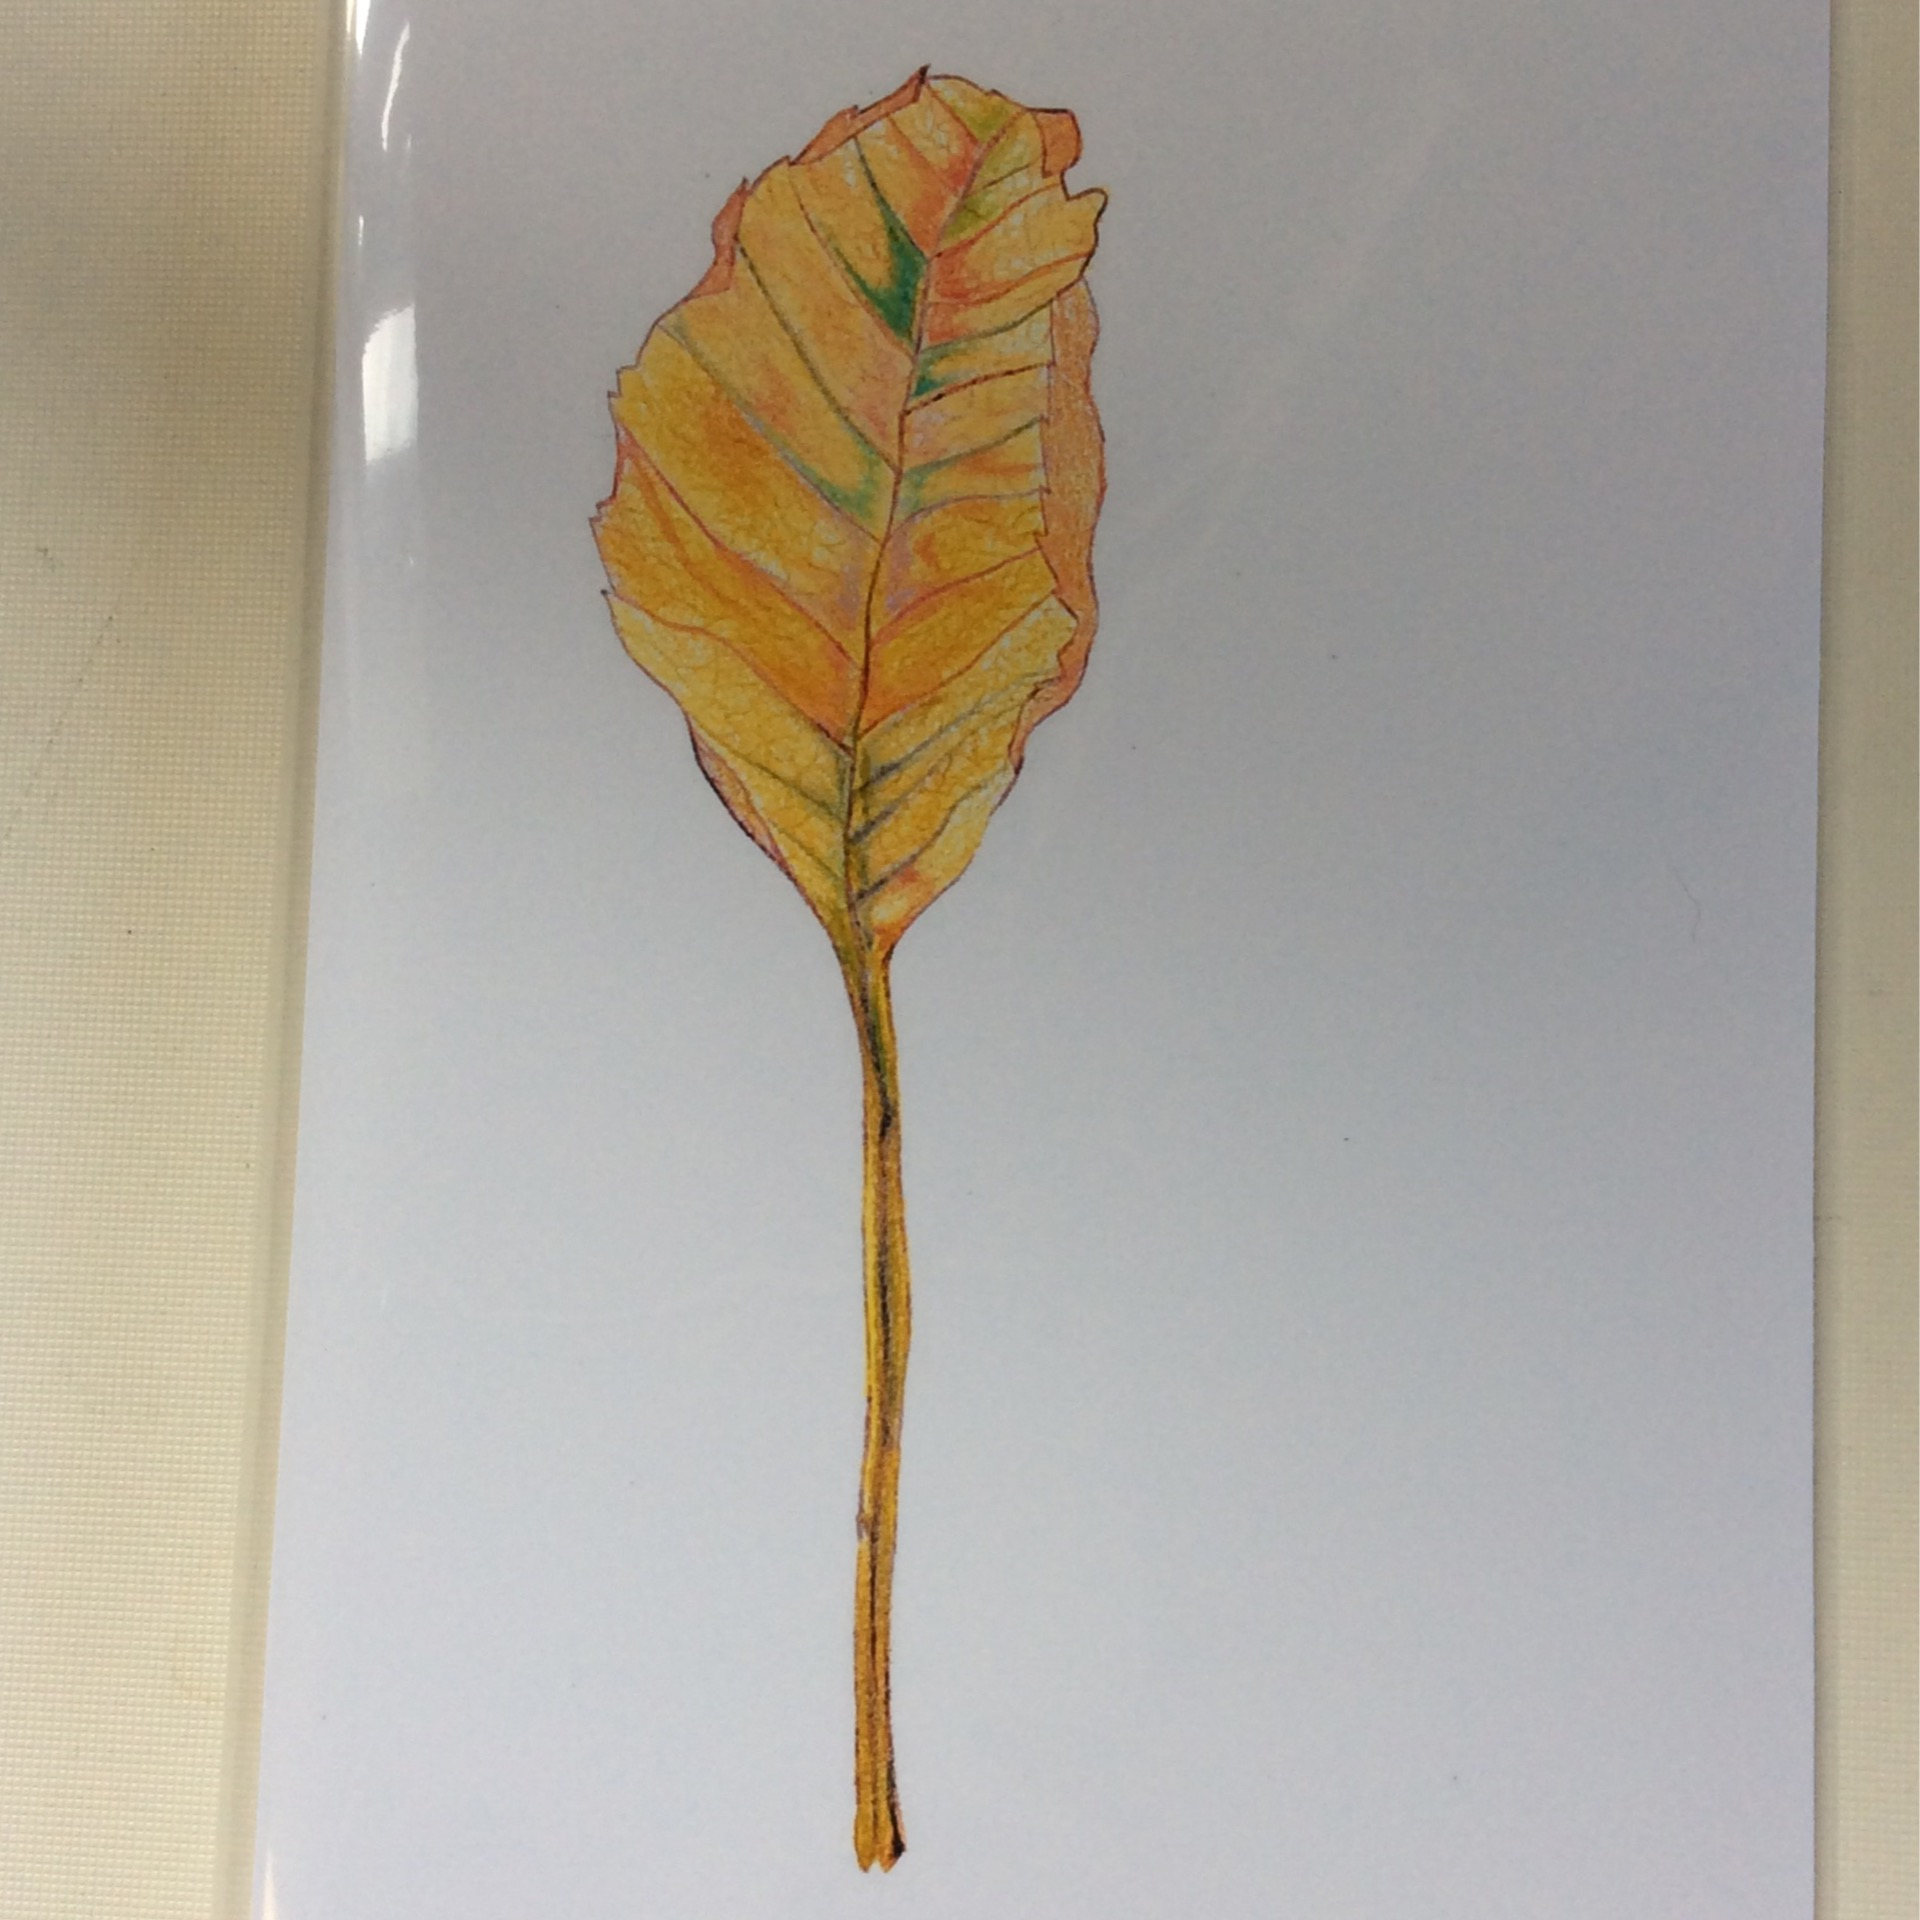 Still-life Leaf